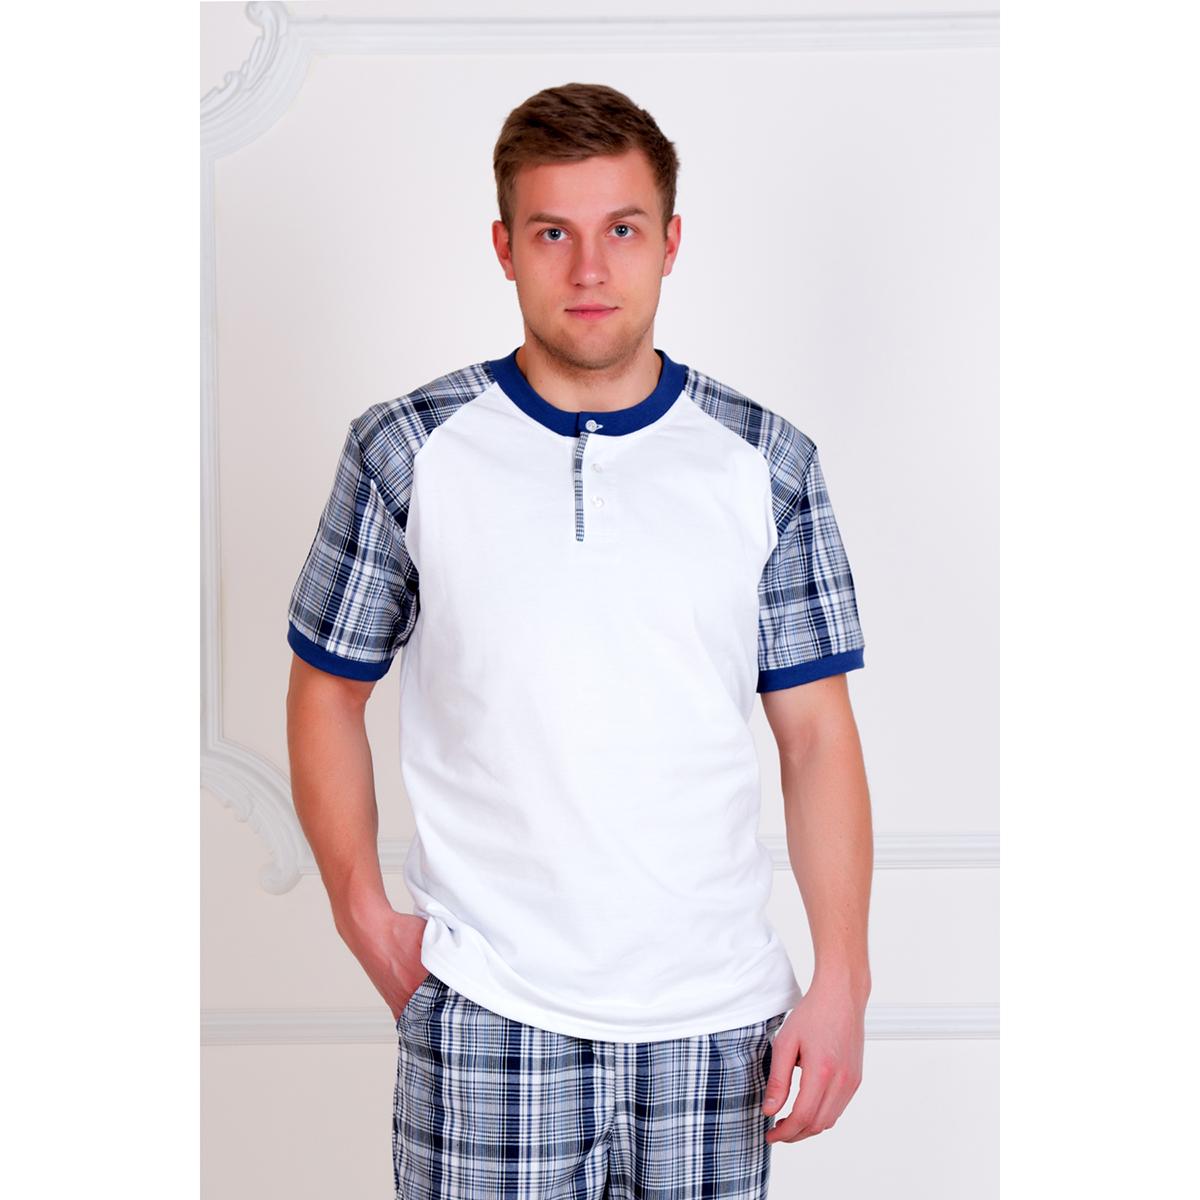 Мужской костюм Аристарх Белый, размер 46Костюмы<br>Обхват груди:92 см<br>Обхват талии:84 см<br>Обхват бедер:100 см<br>Рост:172-180 см<br><br>Тип: Муж. костюм<br>Размер: 46<br>Материал: Пике